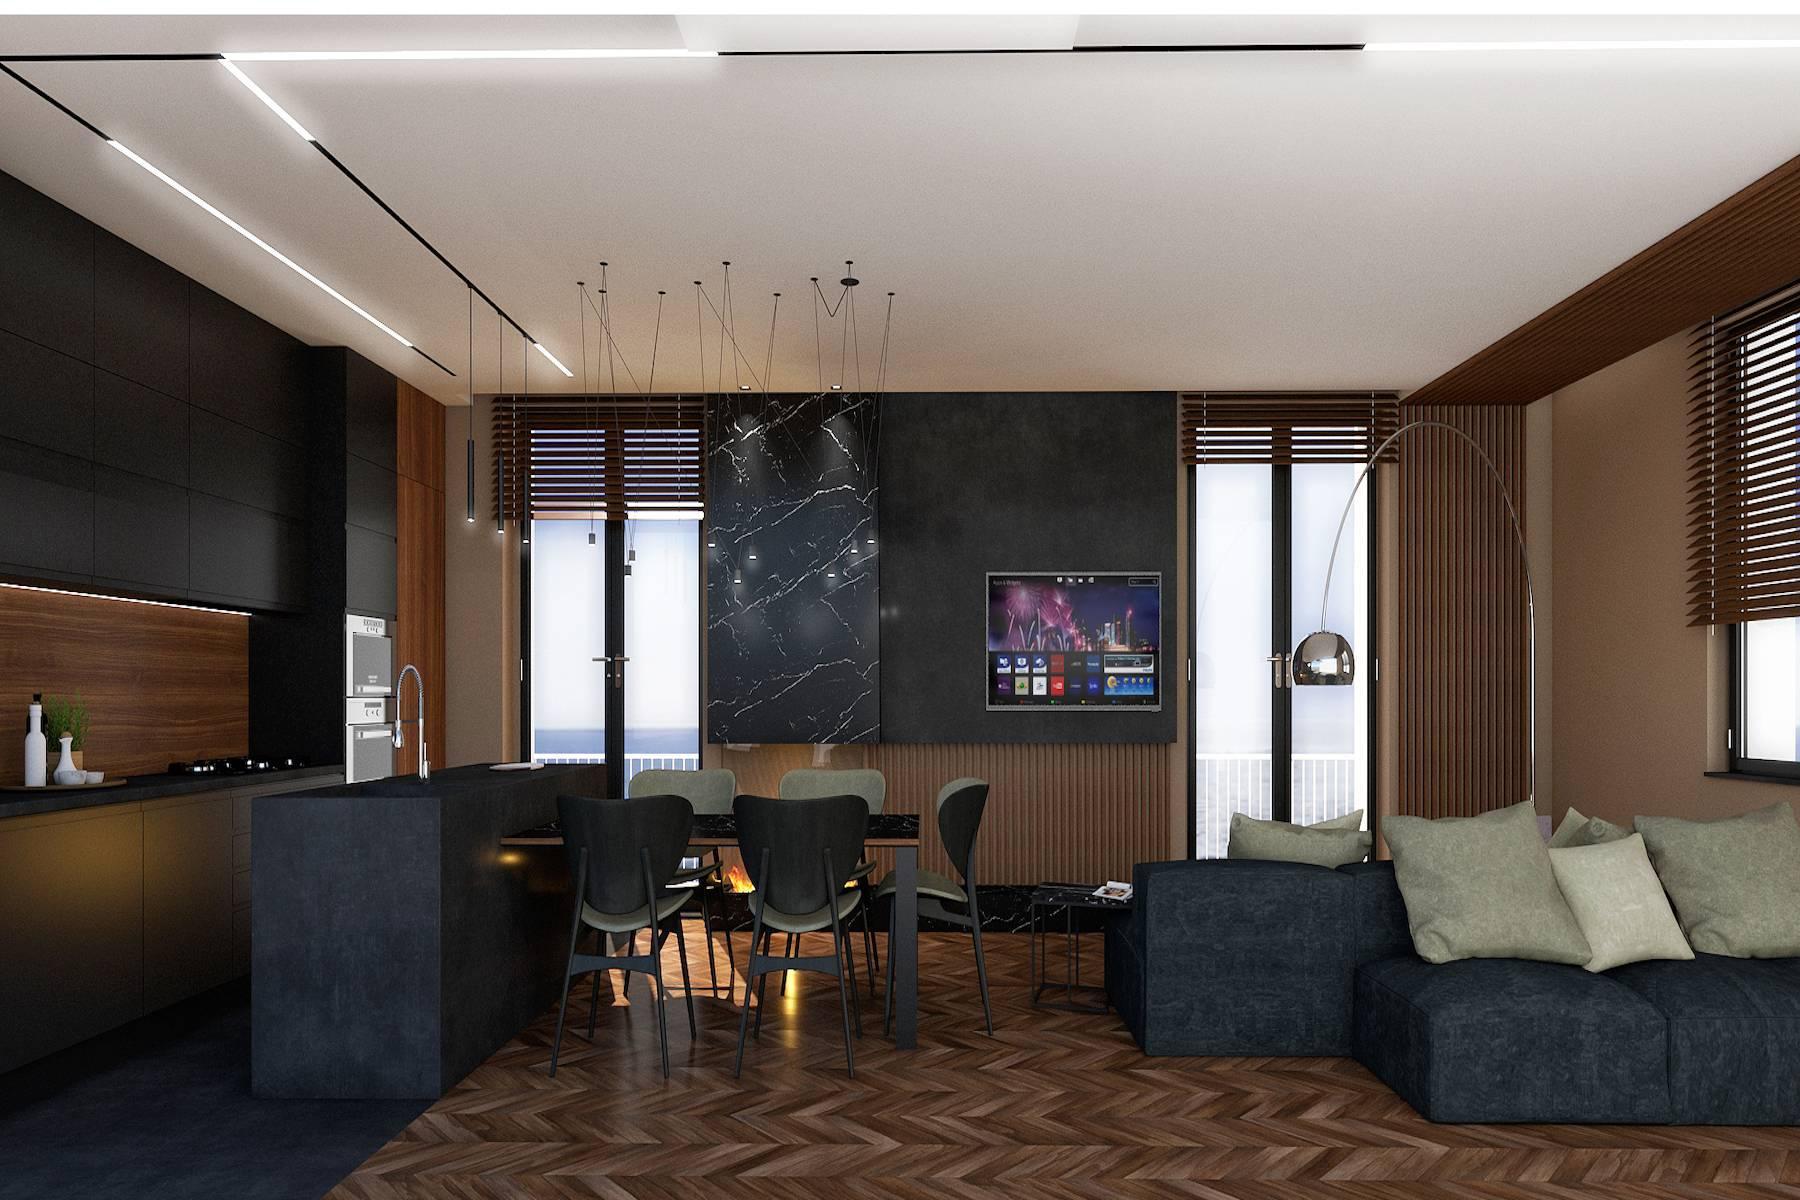 Luxus-Wohnungen am Meer in Viareggio - 5